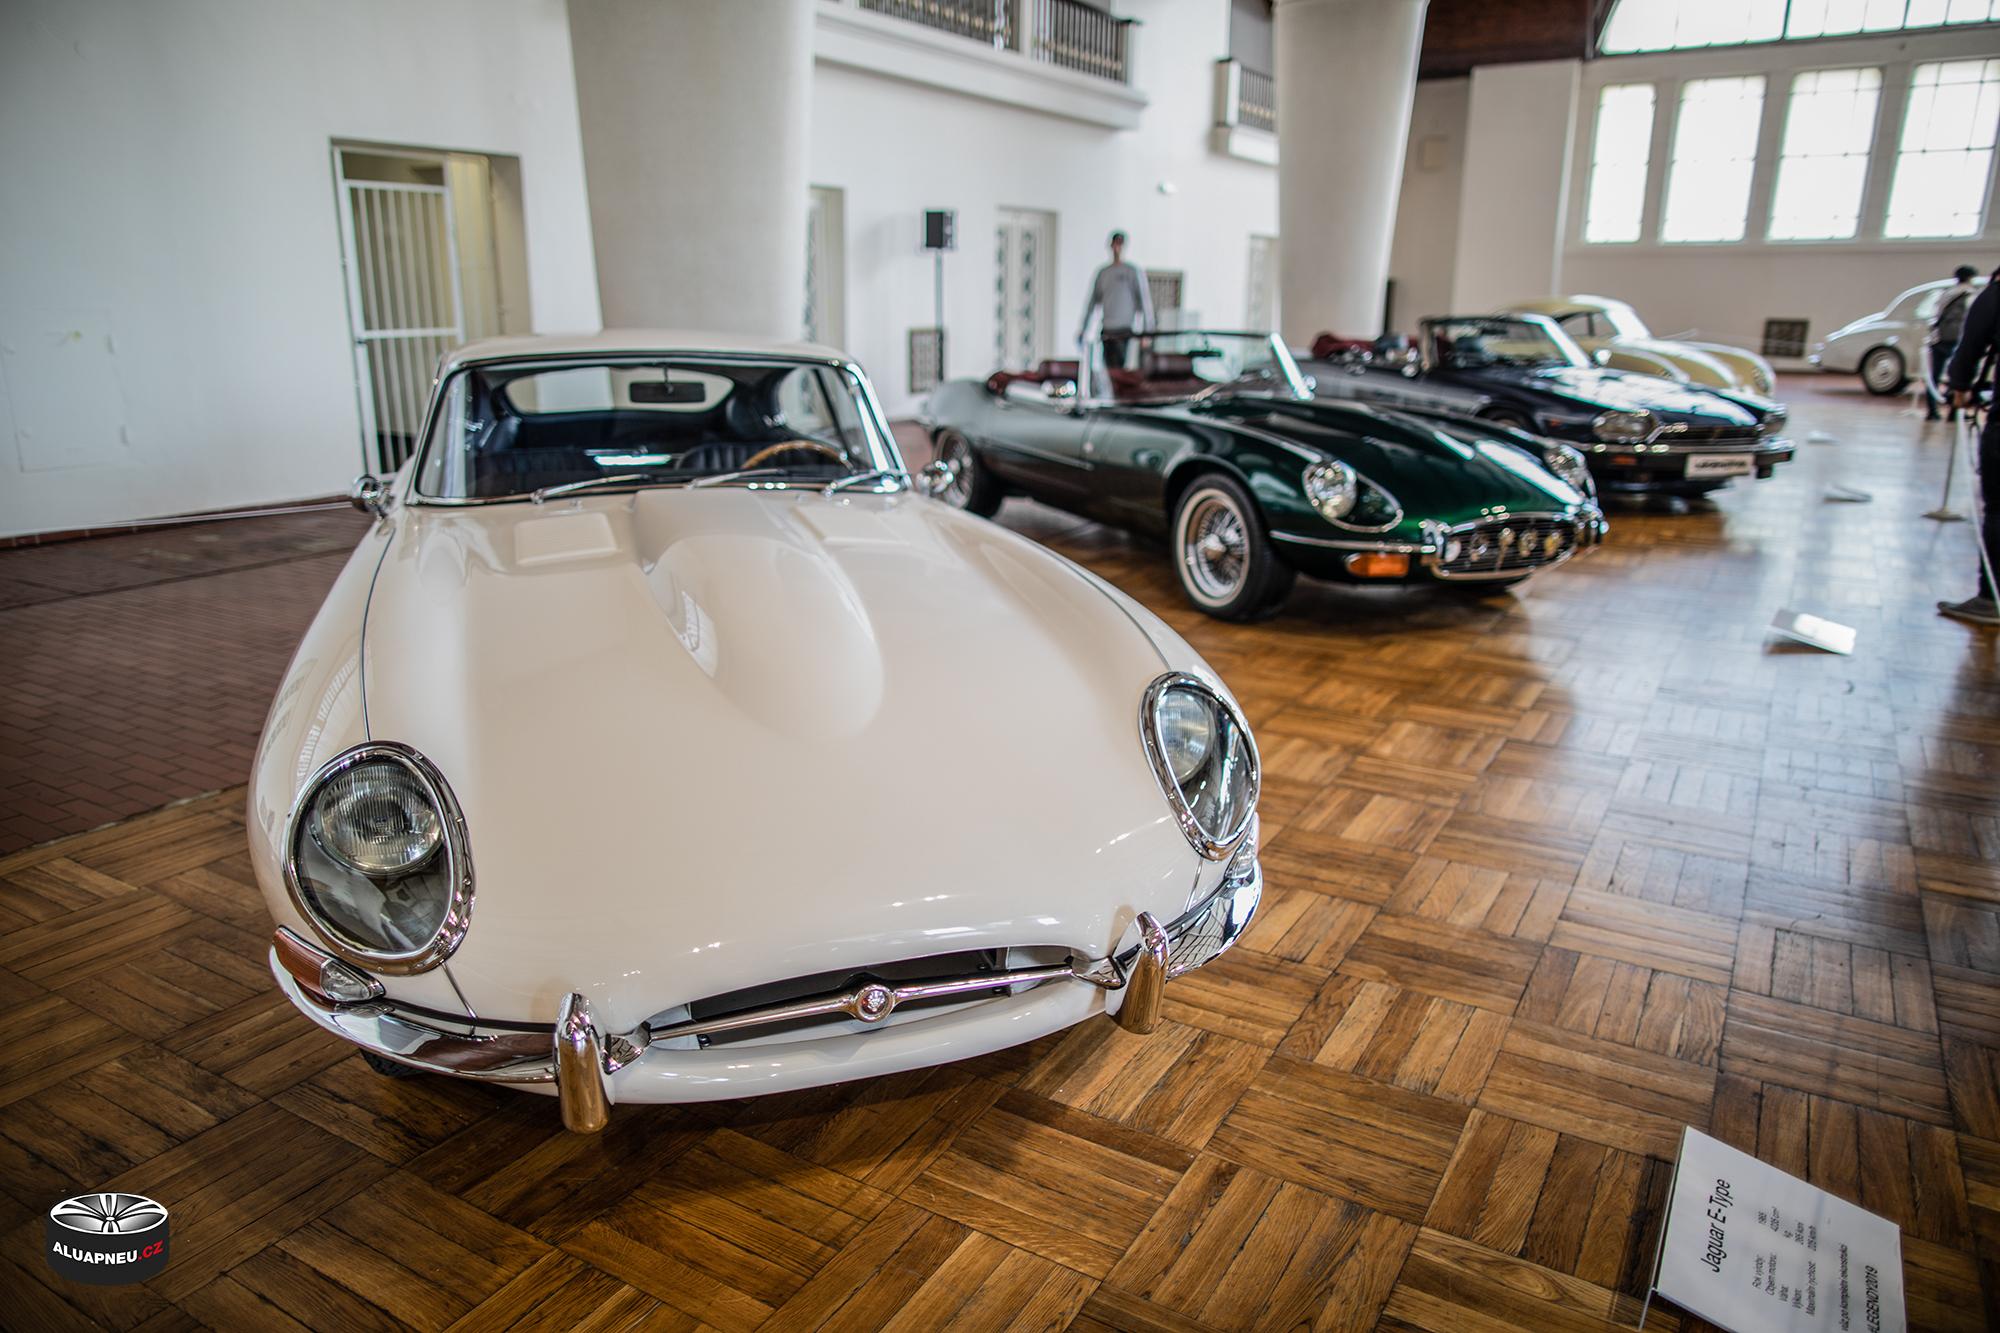 Jaguar Typ E - Youngtimer - www.aluapneu.cz